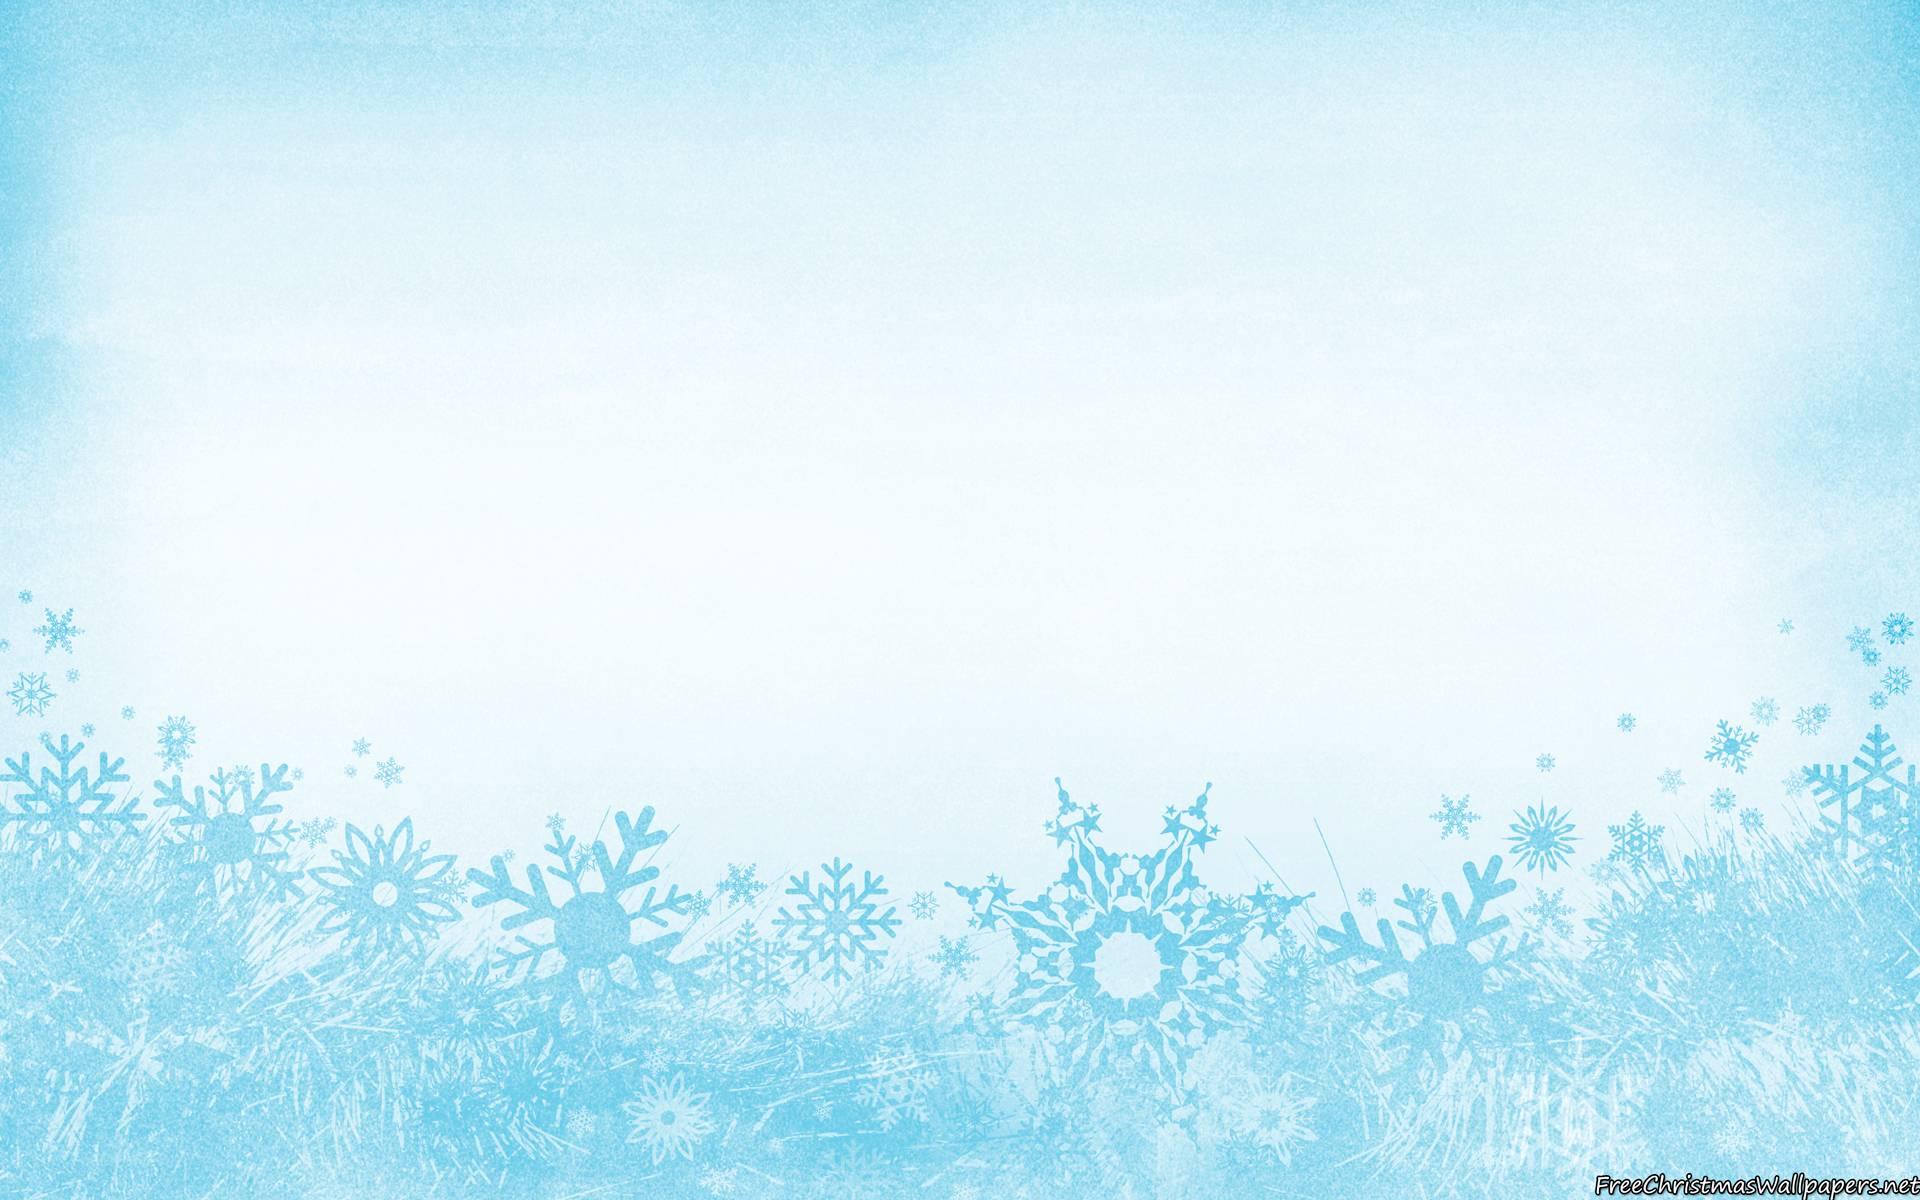 Christmas Backgrounds Image 1920x1200